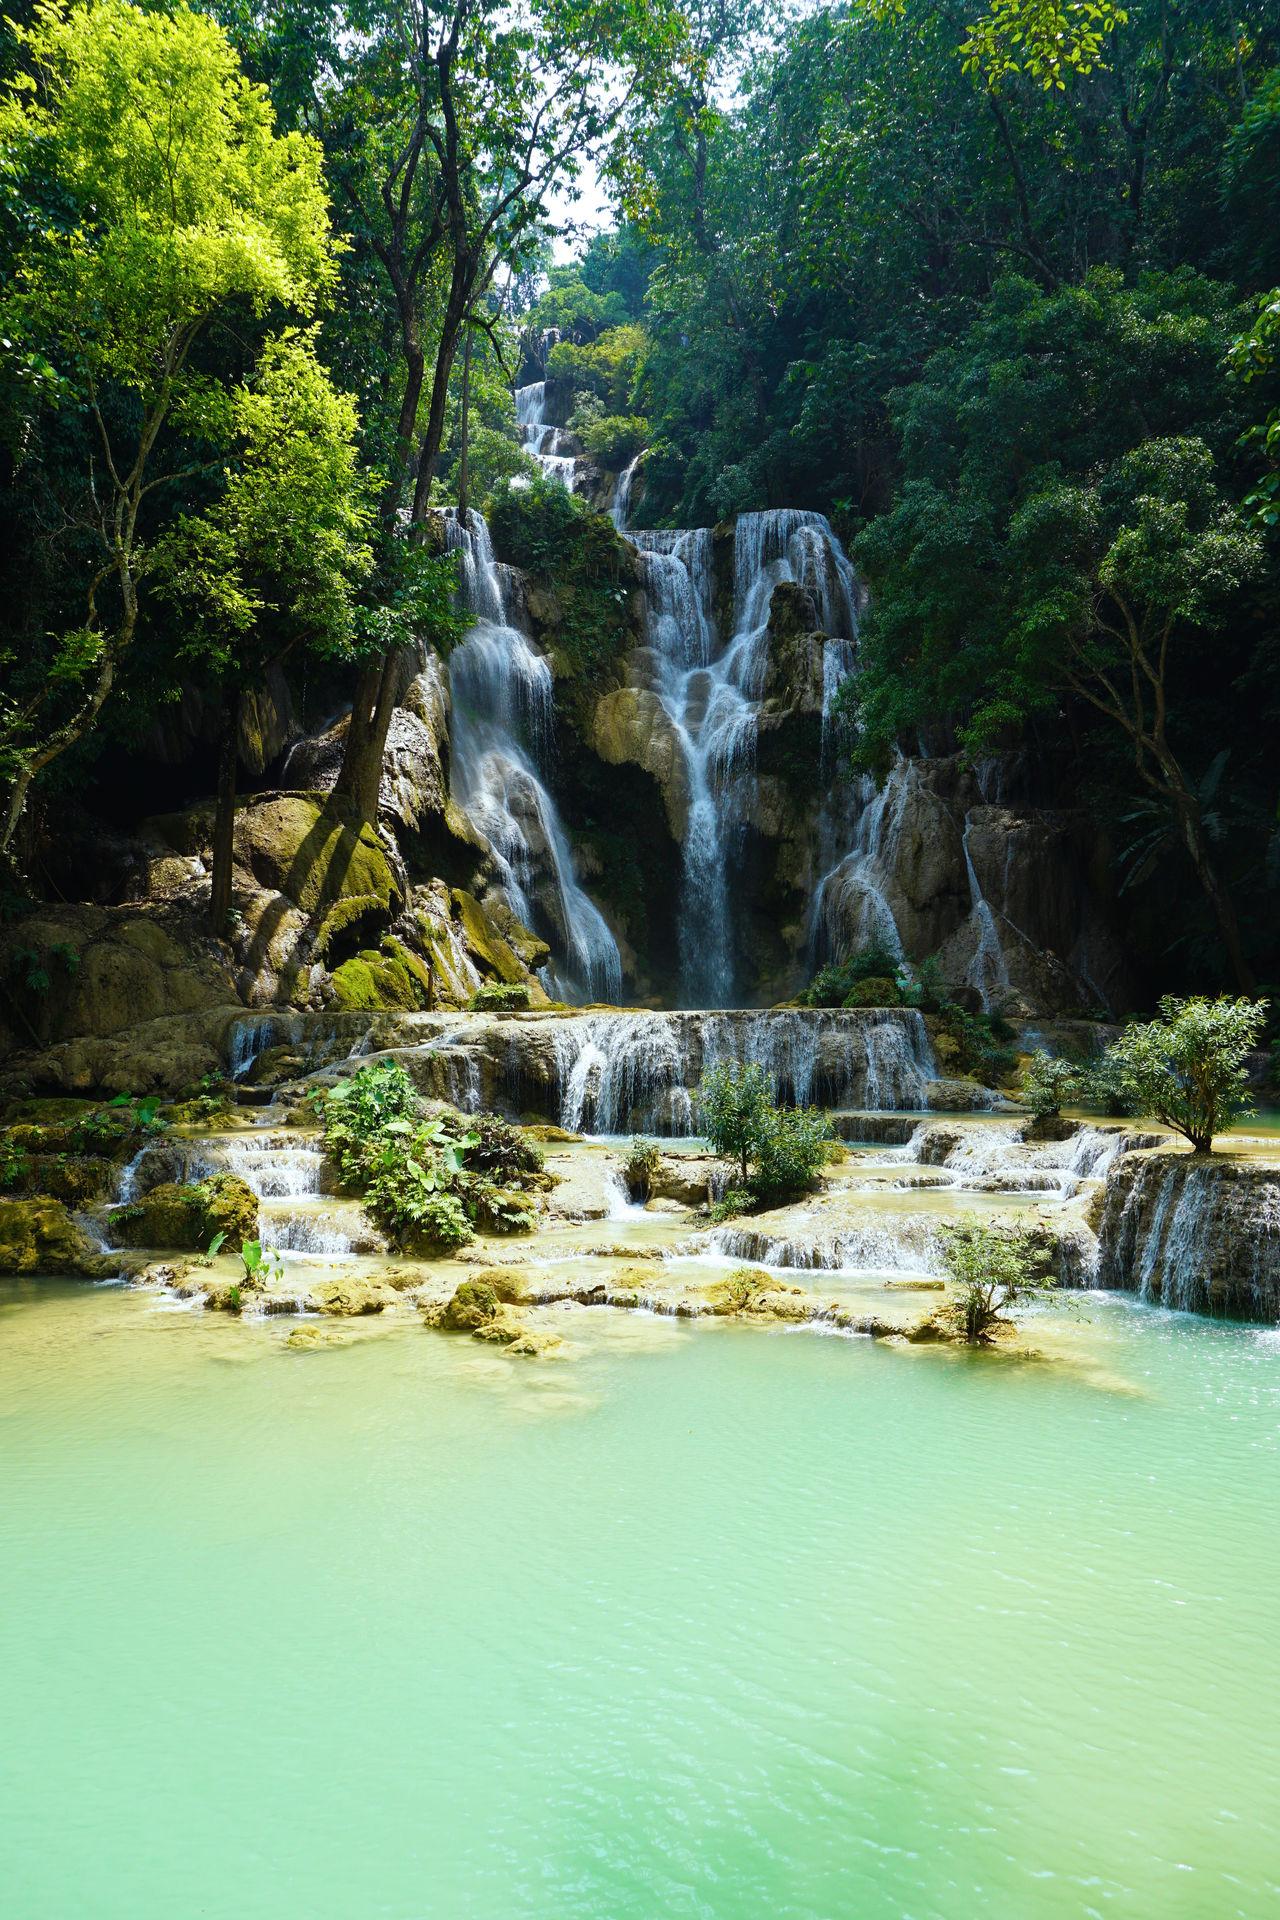 2017 Beauty In Nature Calcareous Sinter Day Forest Kuang Si Falls Kuang Si Waterfalls Landscape Laos Luang Phabang Luang Prabang Nature Outdoors Pool Scenics Tranquil Scene Tranquility Travertine Tree Water Waterfall World Heritage クアンシーの滝 ラオス ルアンパバーン